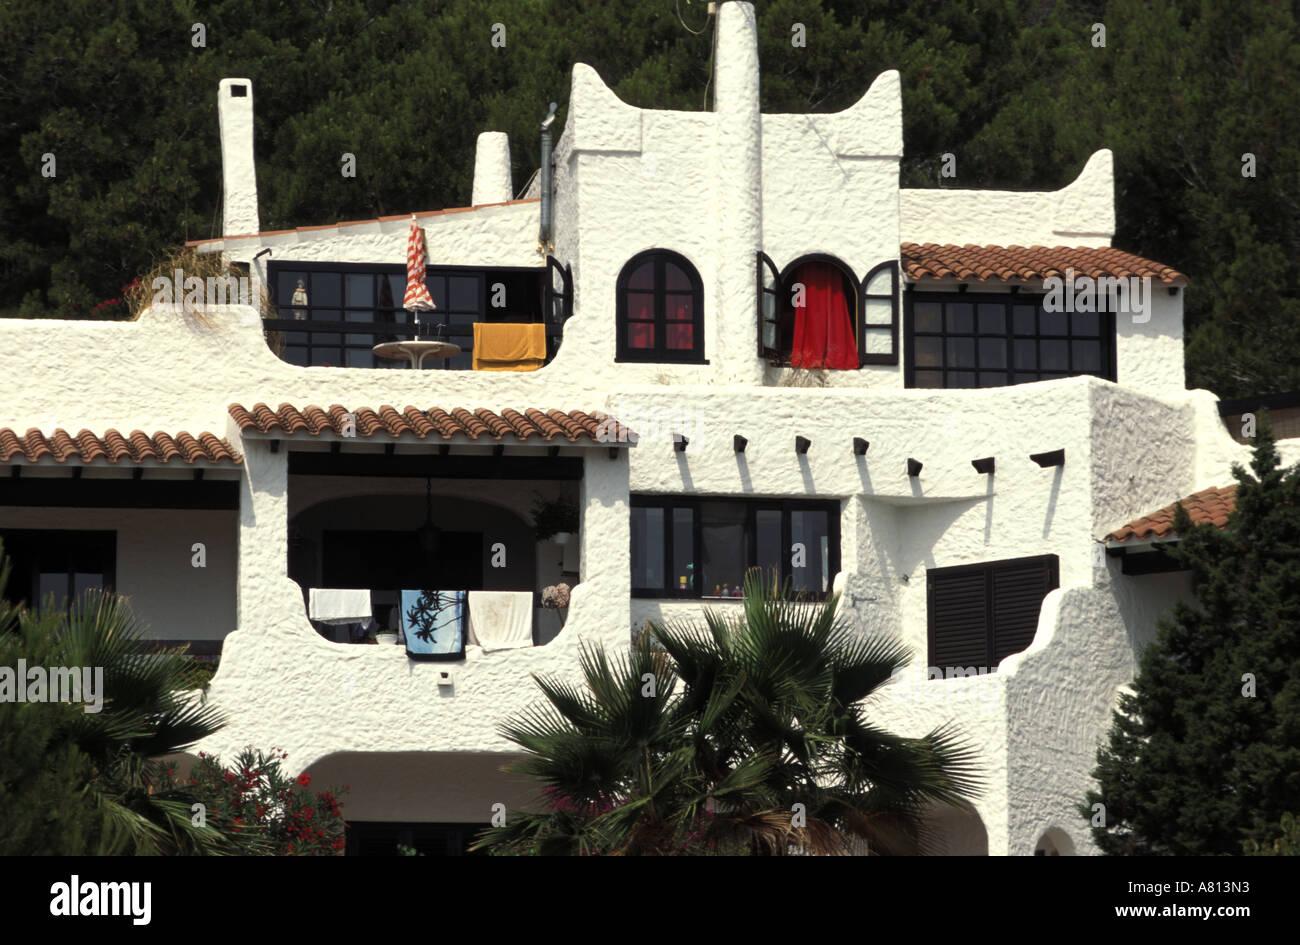 Spain, Balearic Islands, Ibiza, design 70's house - Stock Image